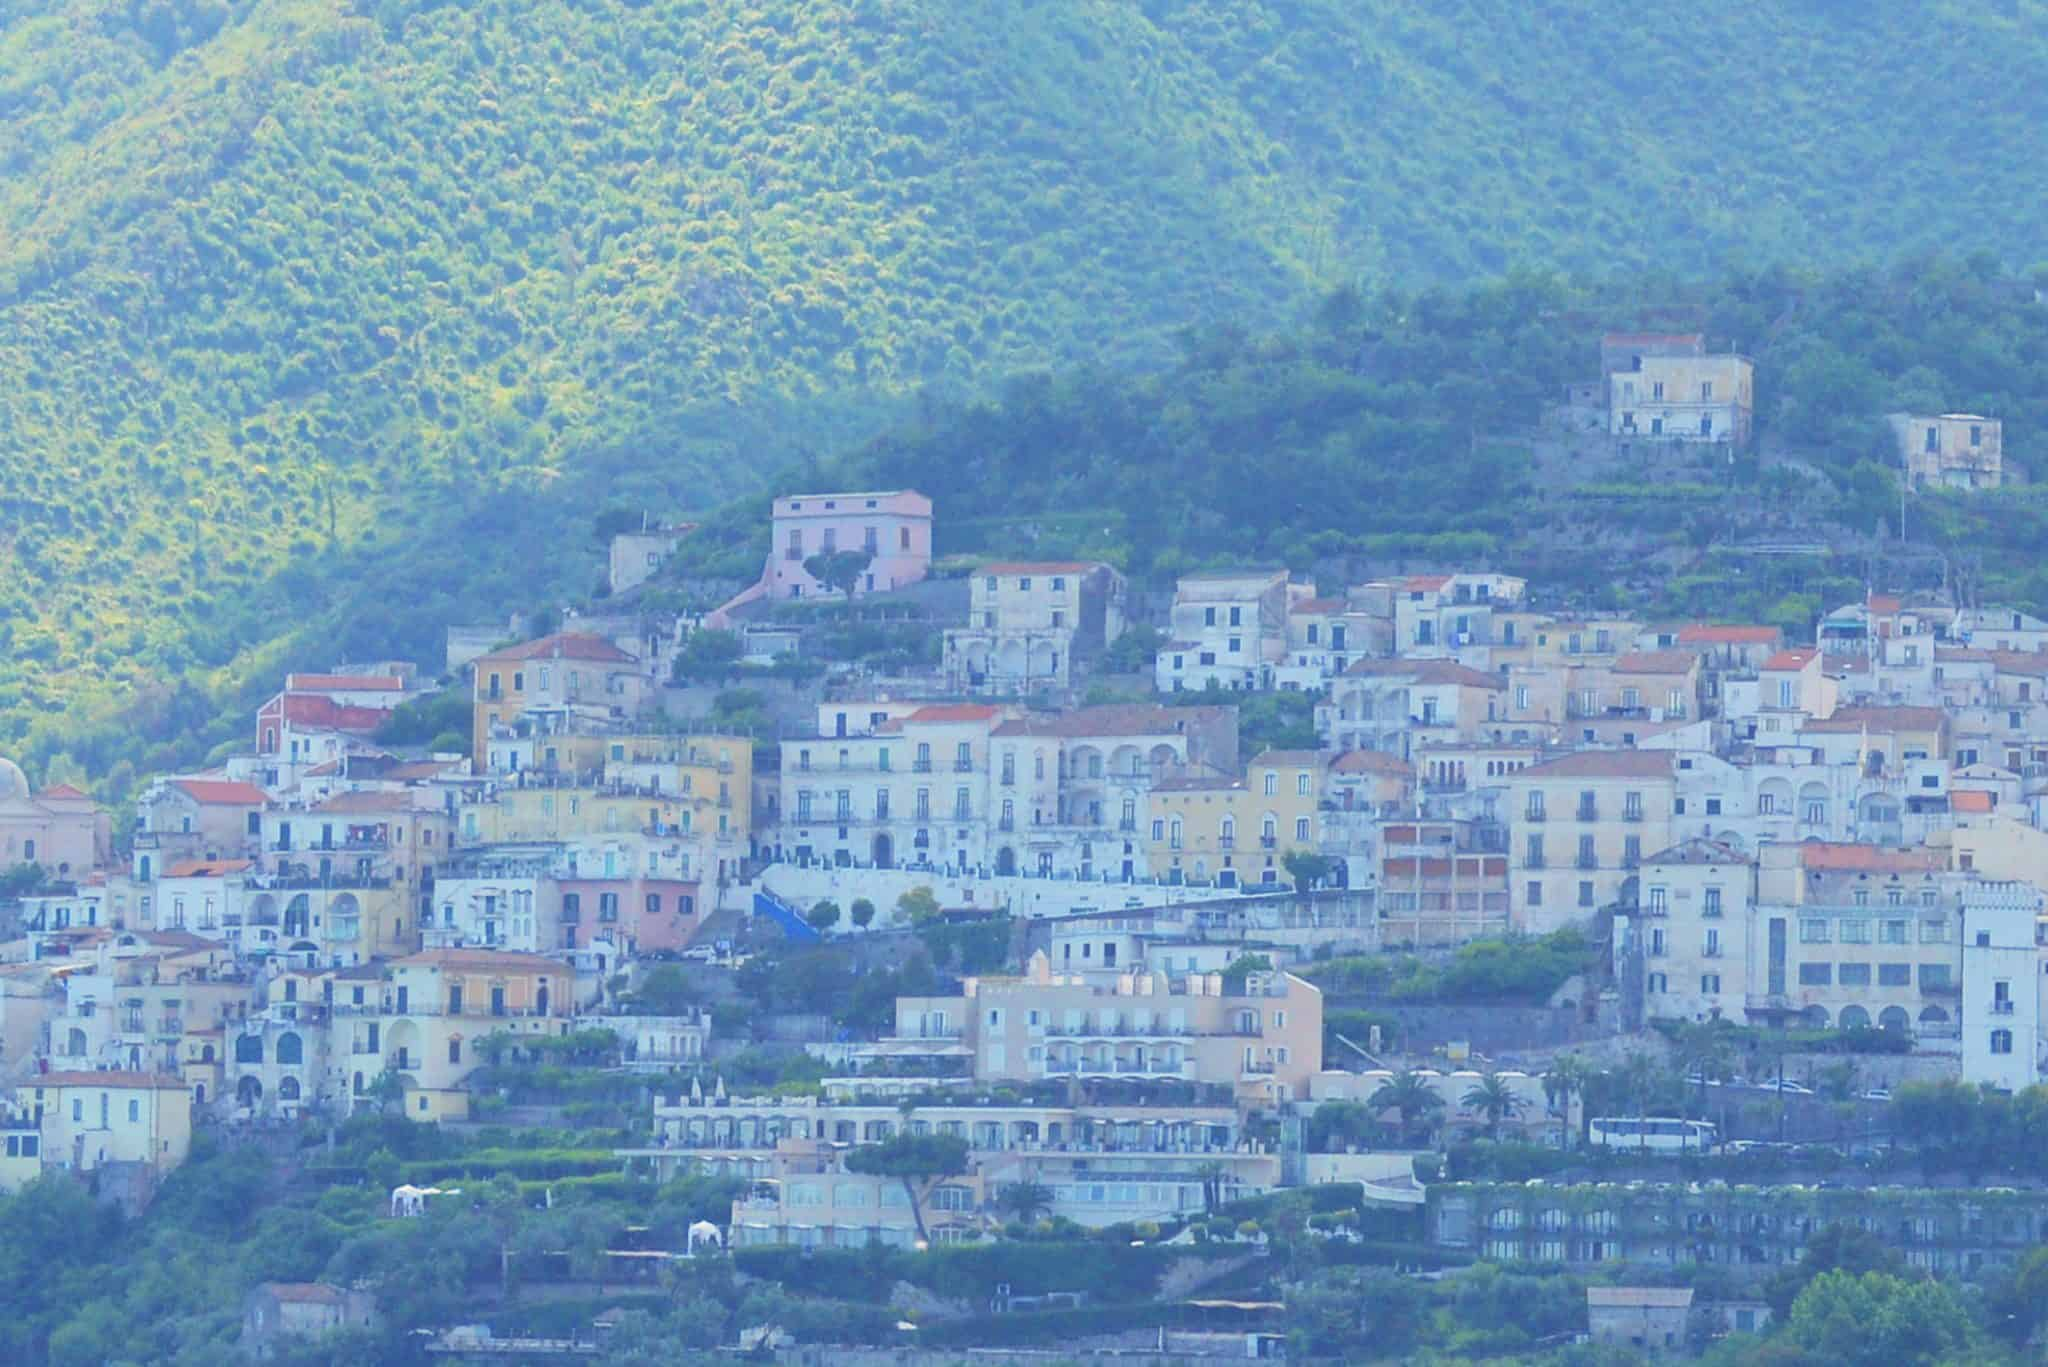 Planning Your Dream Vacation to Vietri Sul Mare, Italy on the Amalfi Coast. #traveltoitaly #amalficoast #italy www.savoryexperiments.com